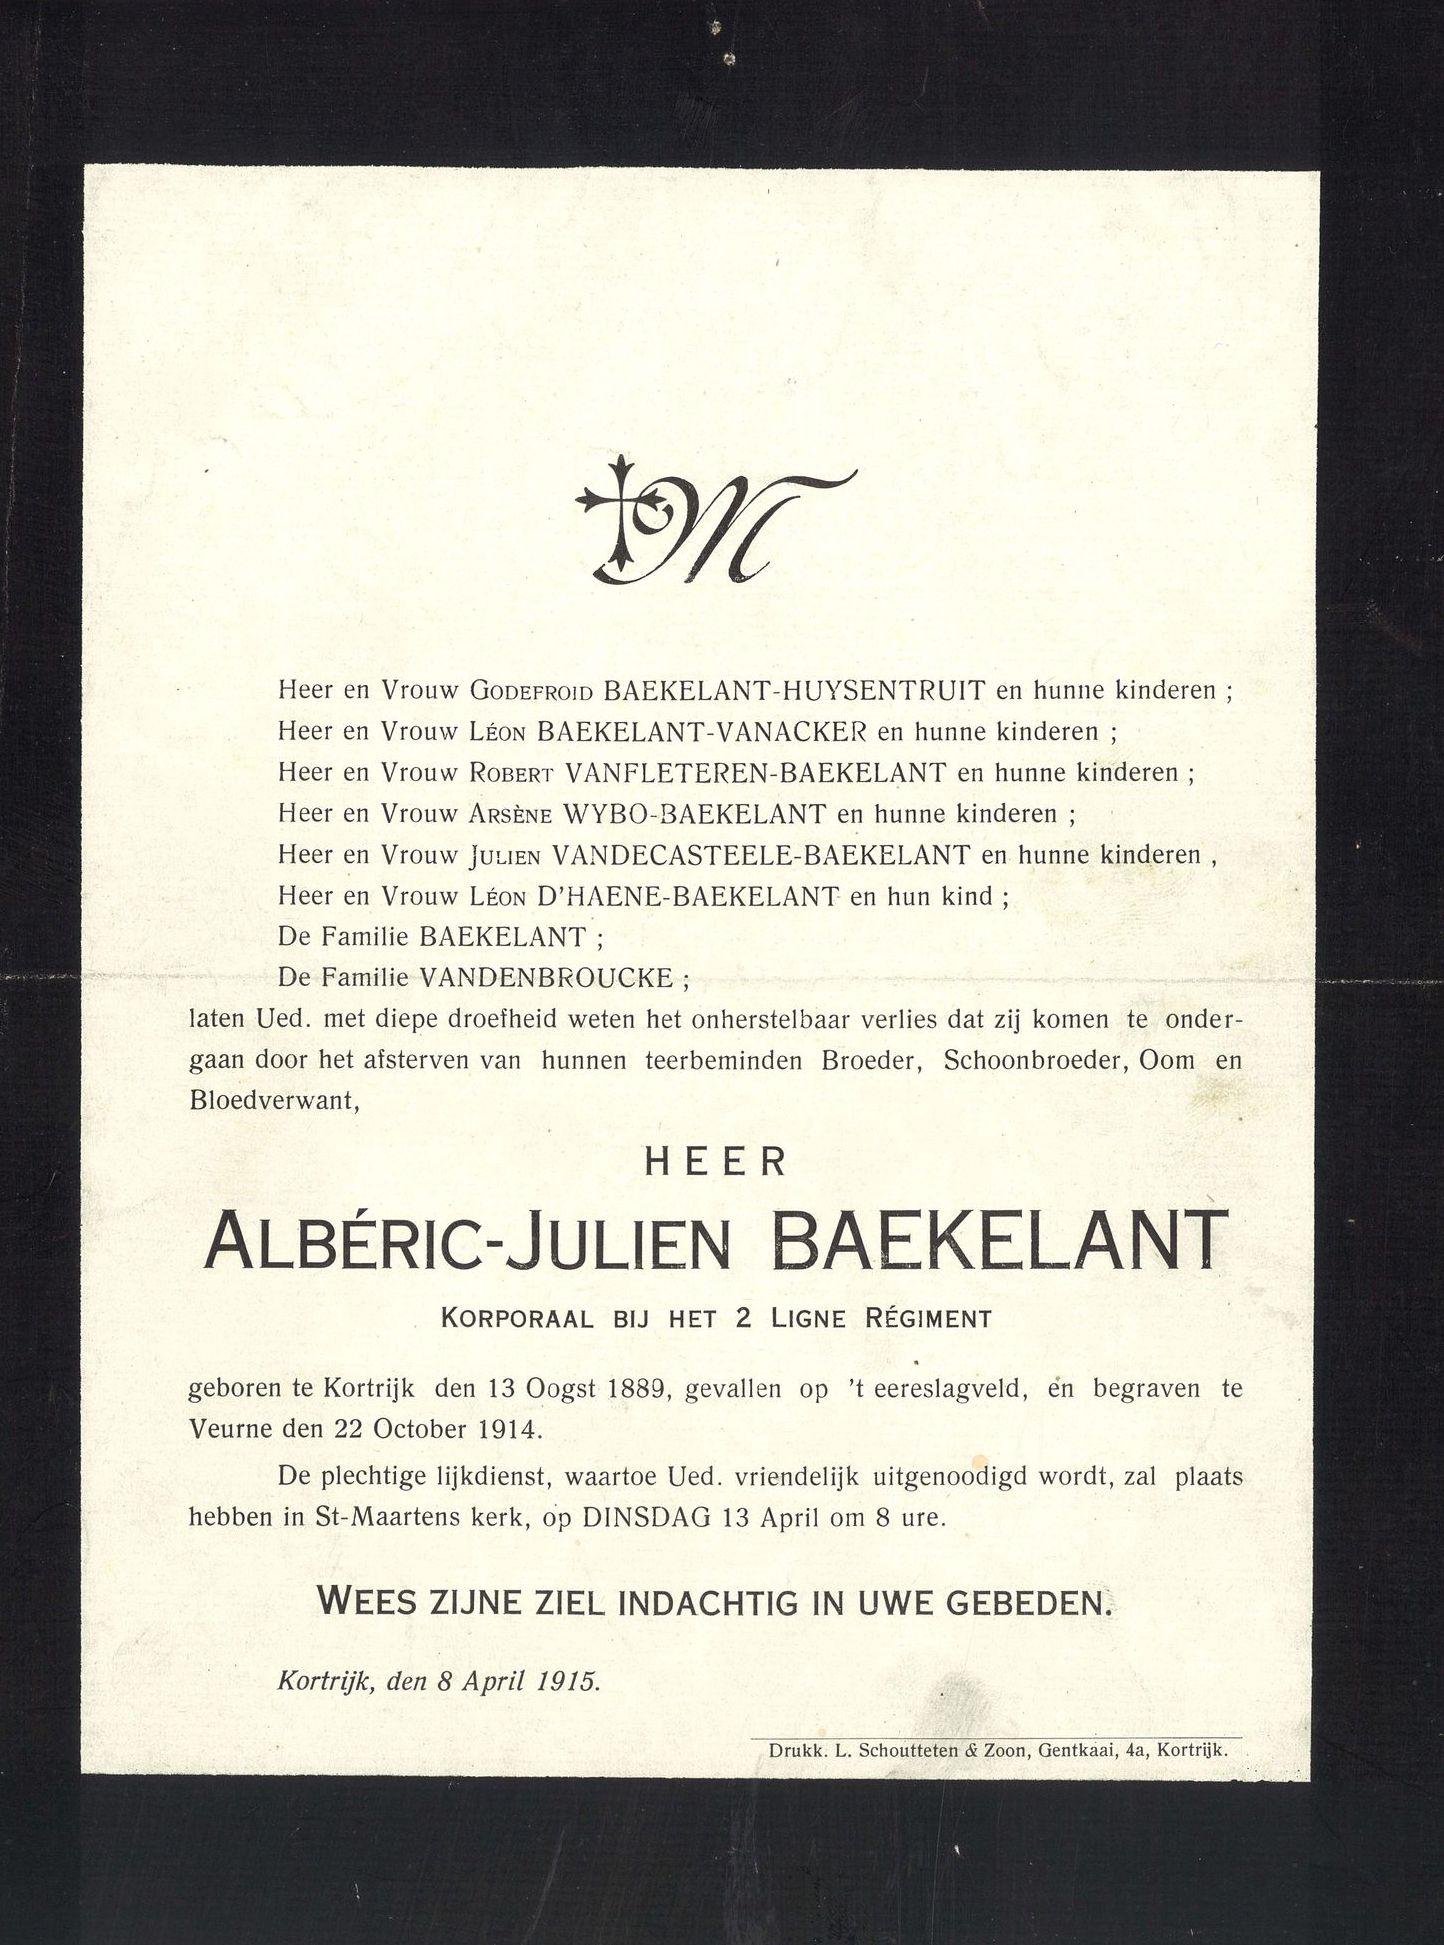 Albéric-Julien Baekelant